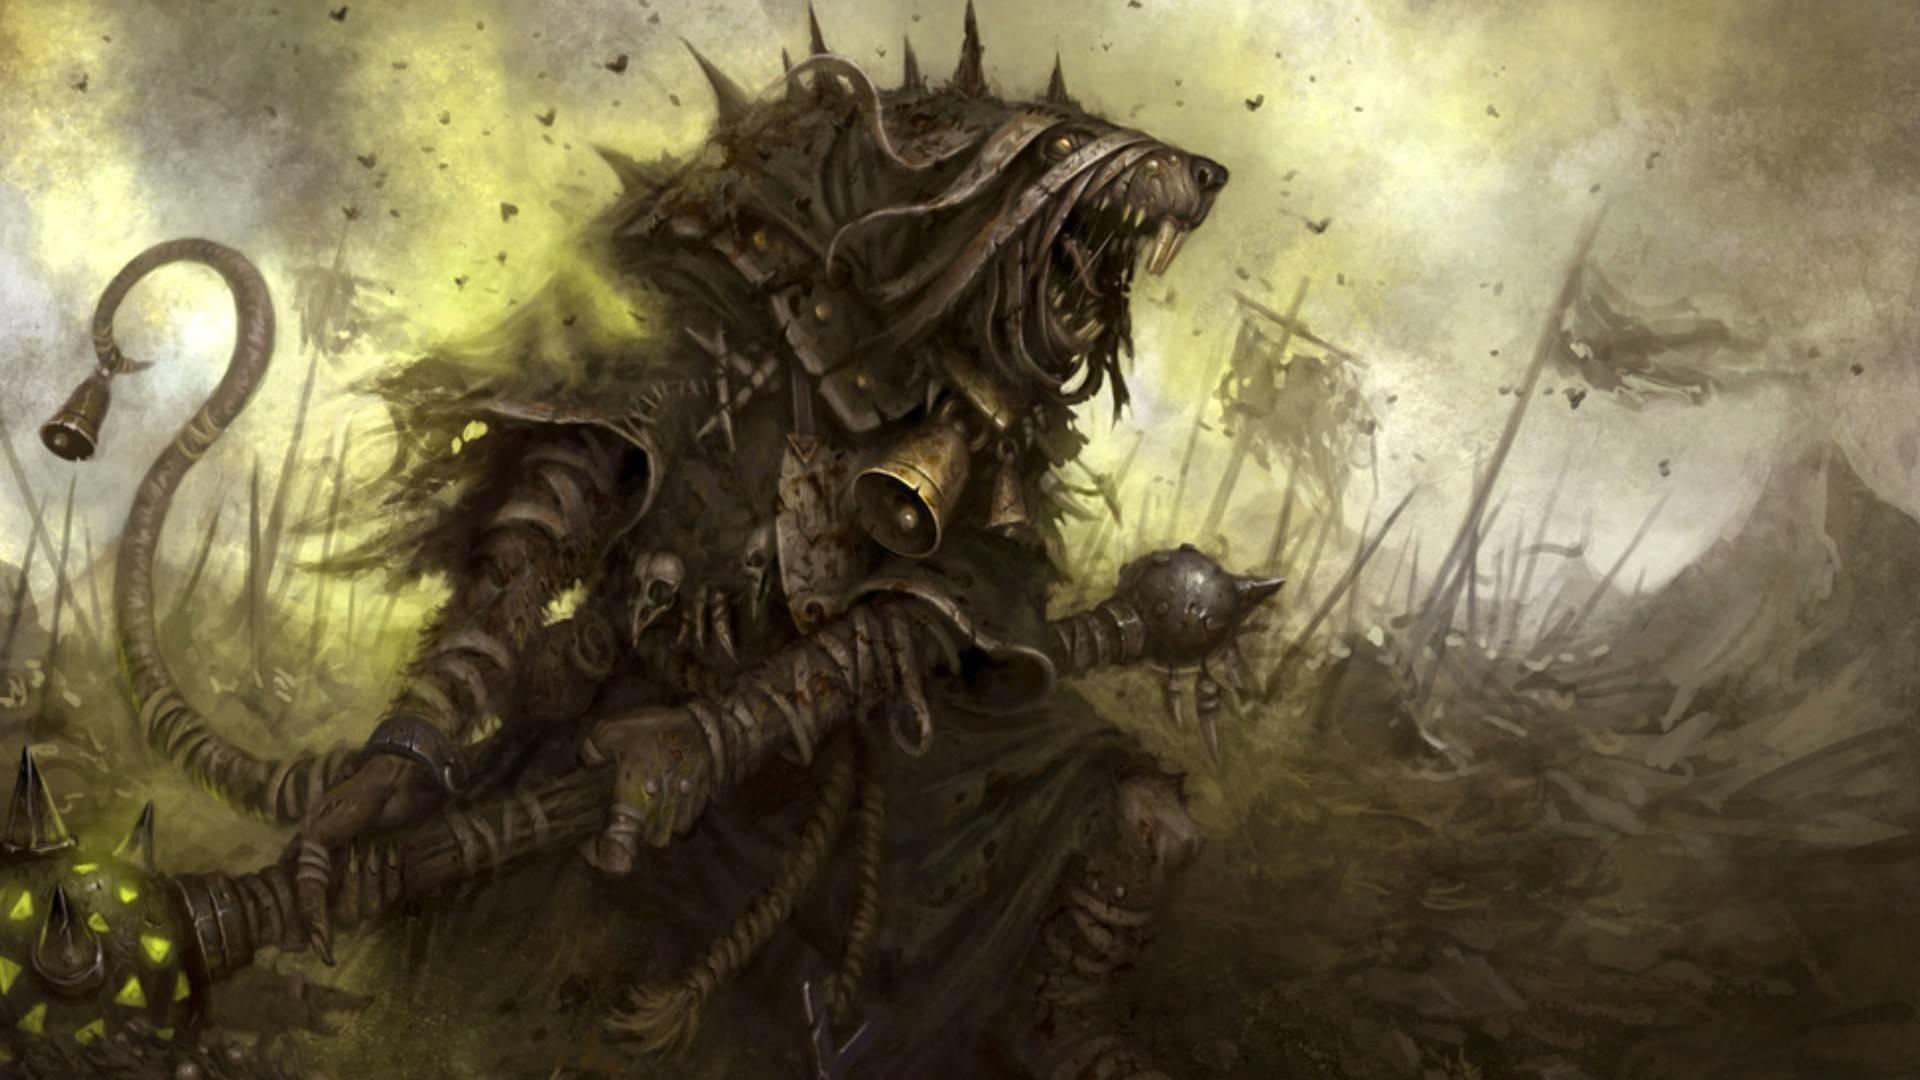 Image – Warhammer-fantasy-1920×1080-wallpaper-2368751.jpg   Warhammer Wiki    FANDOM powered by Wikia